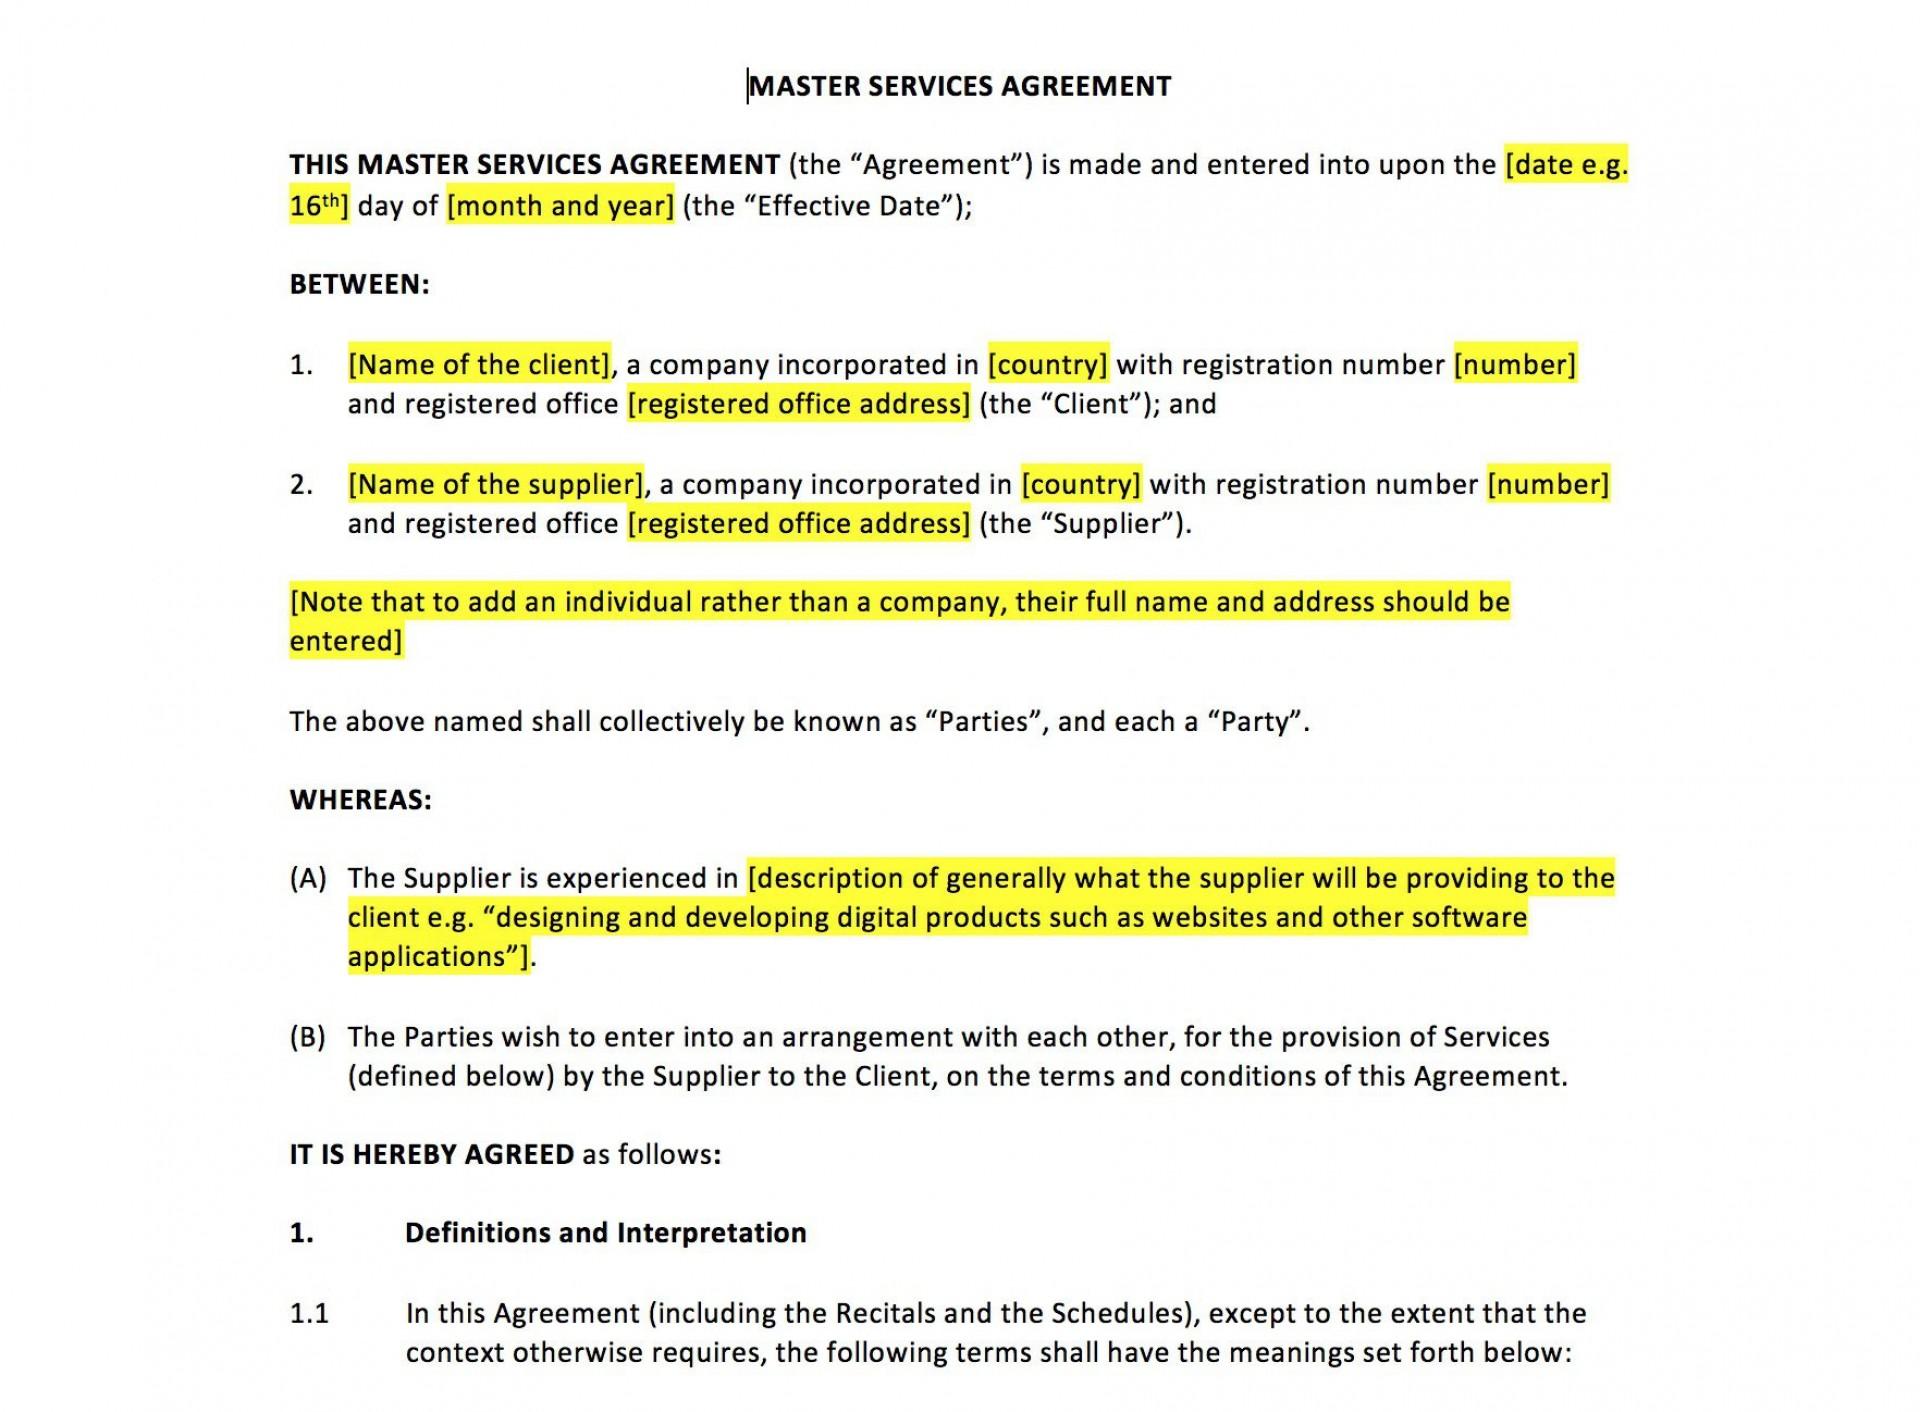 006 Shocking Master Service Agreement Template Inspiration  Marketing For Software Development1920